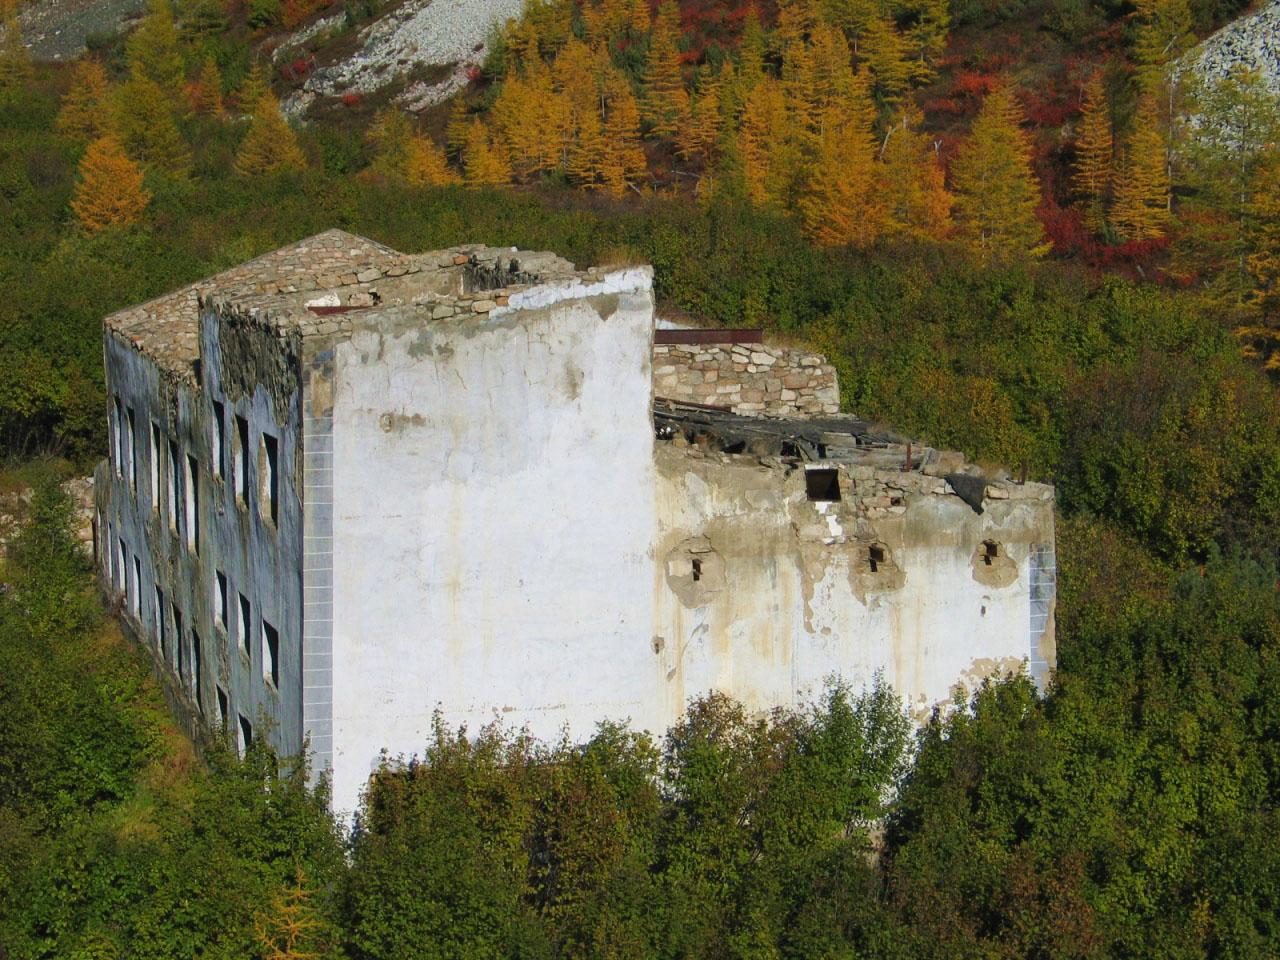 «Гидрометаллургический завод». Фабрика по обогащению урана.